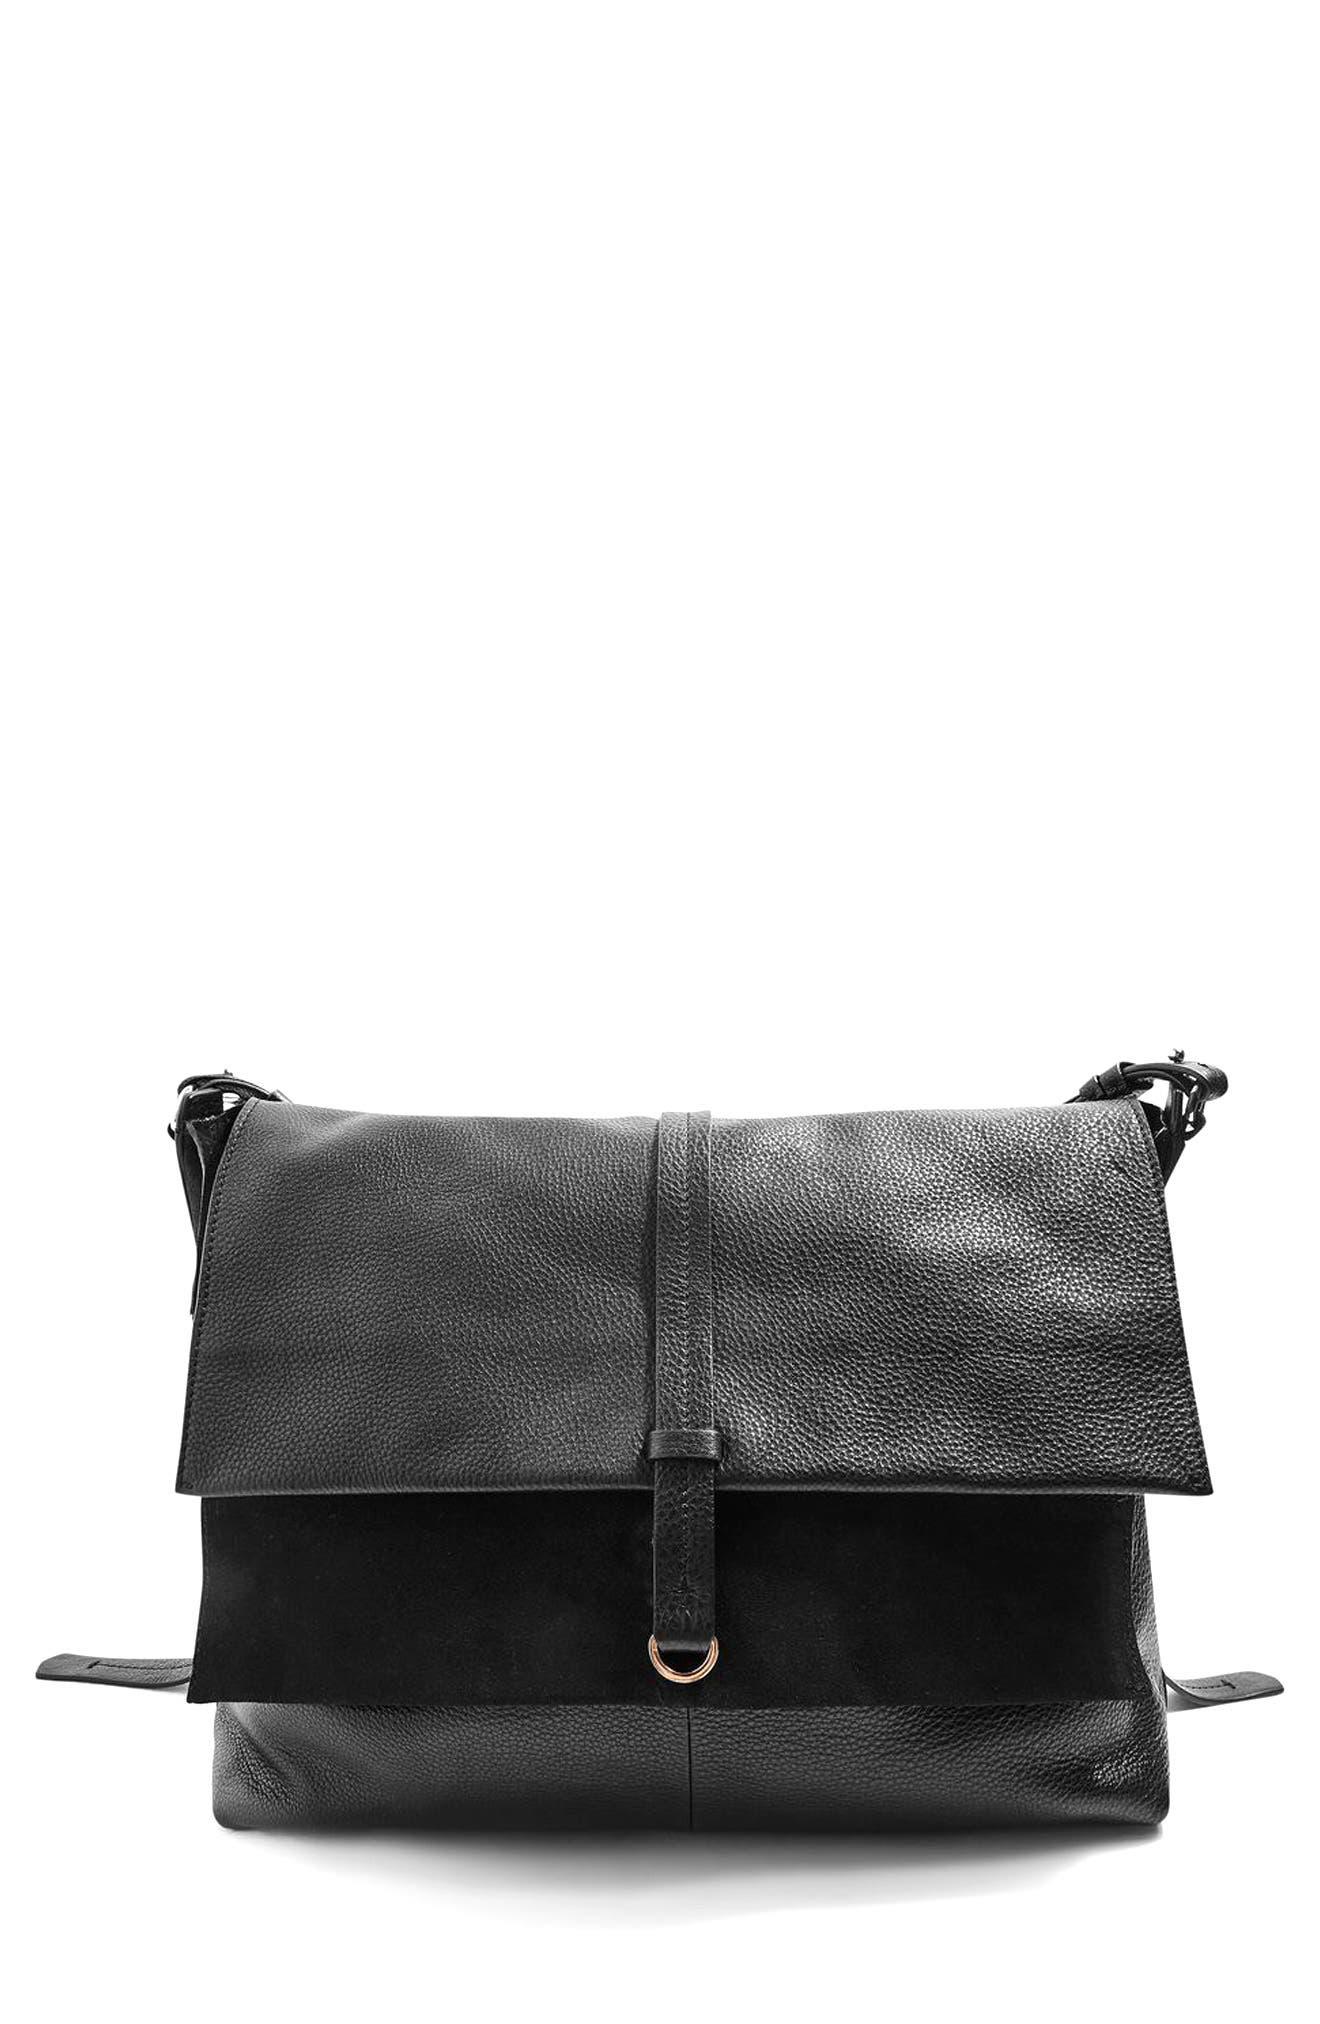 Alternate Image 1 Selected - Topshop Premium Leather Hobo Bag